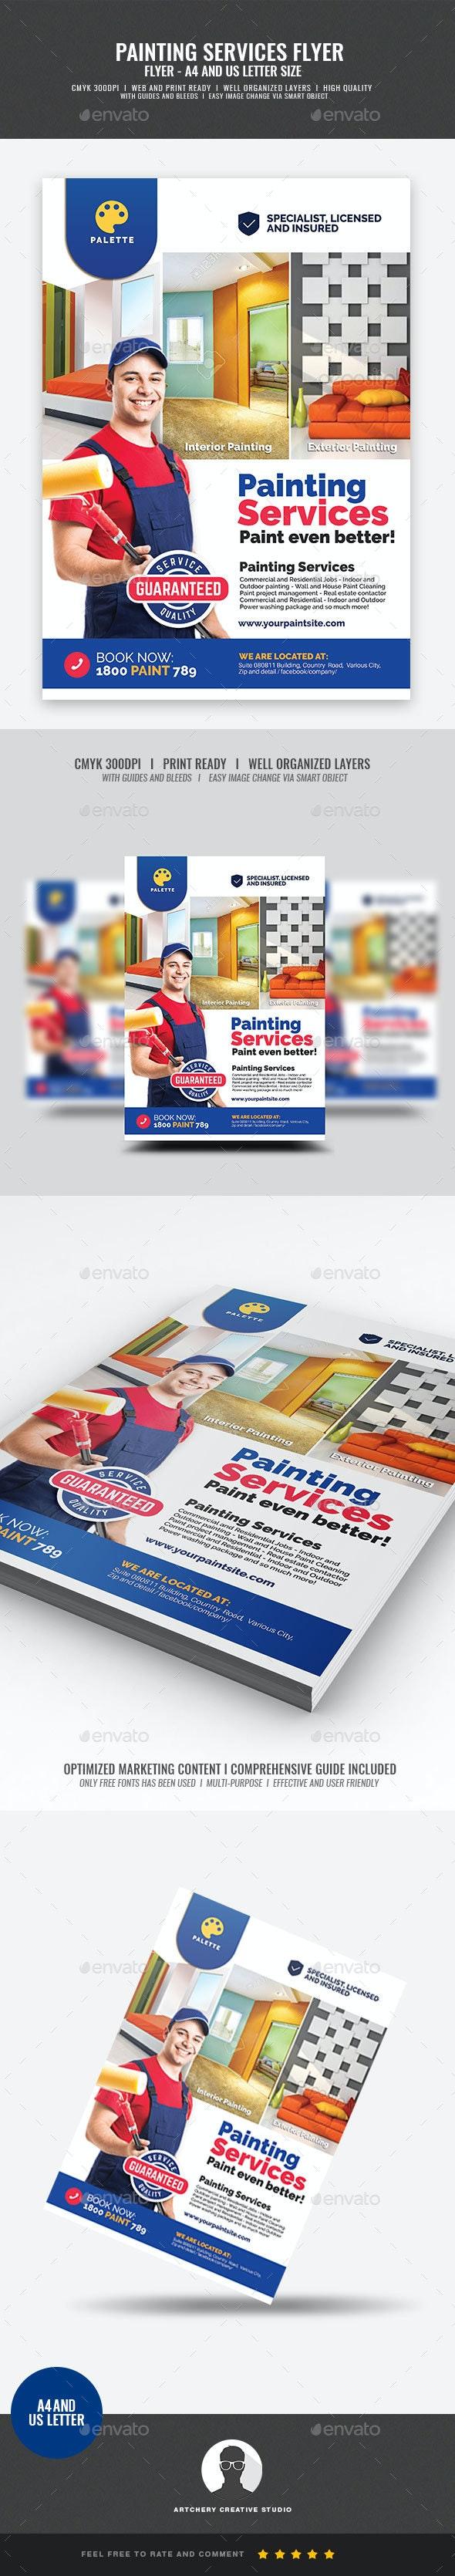 Paint Company Promotional Flyer - Commerce Flyers